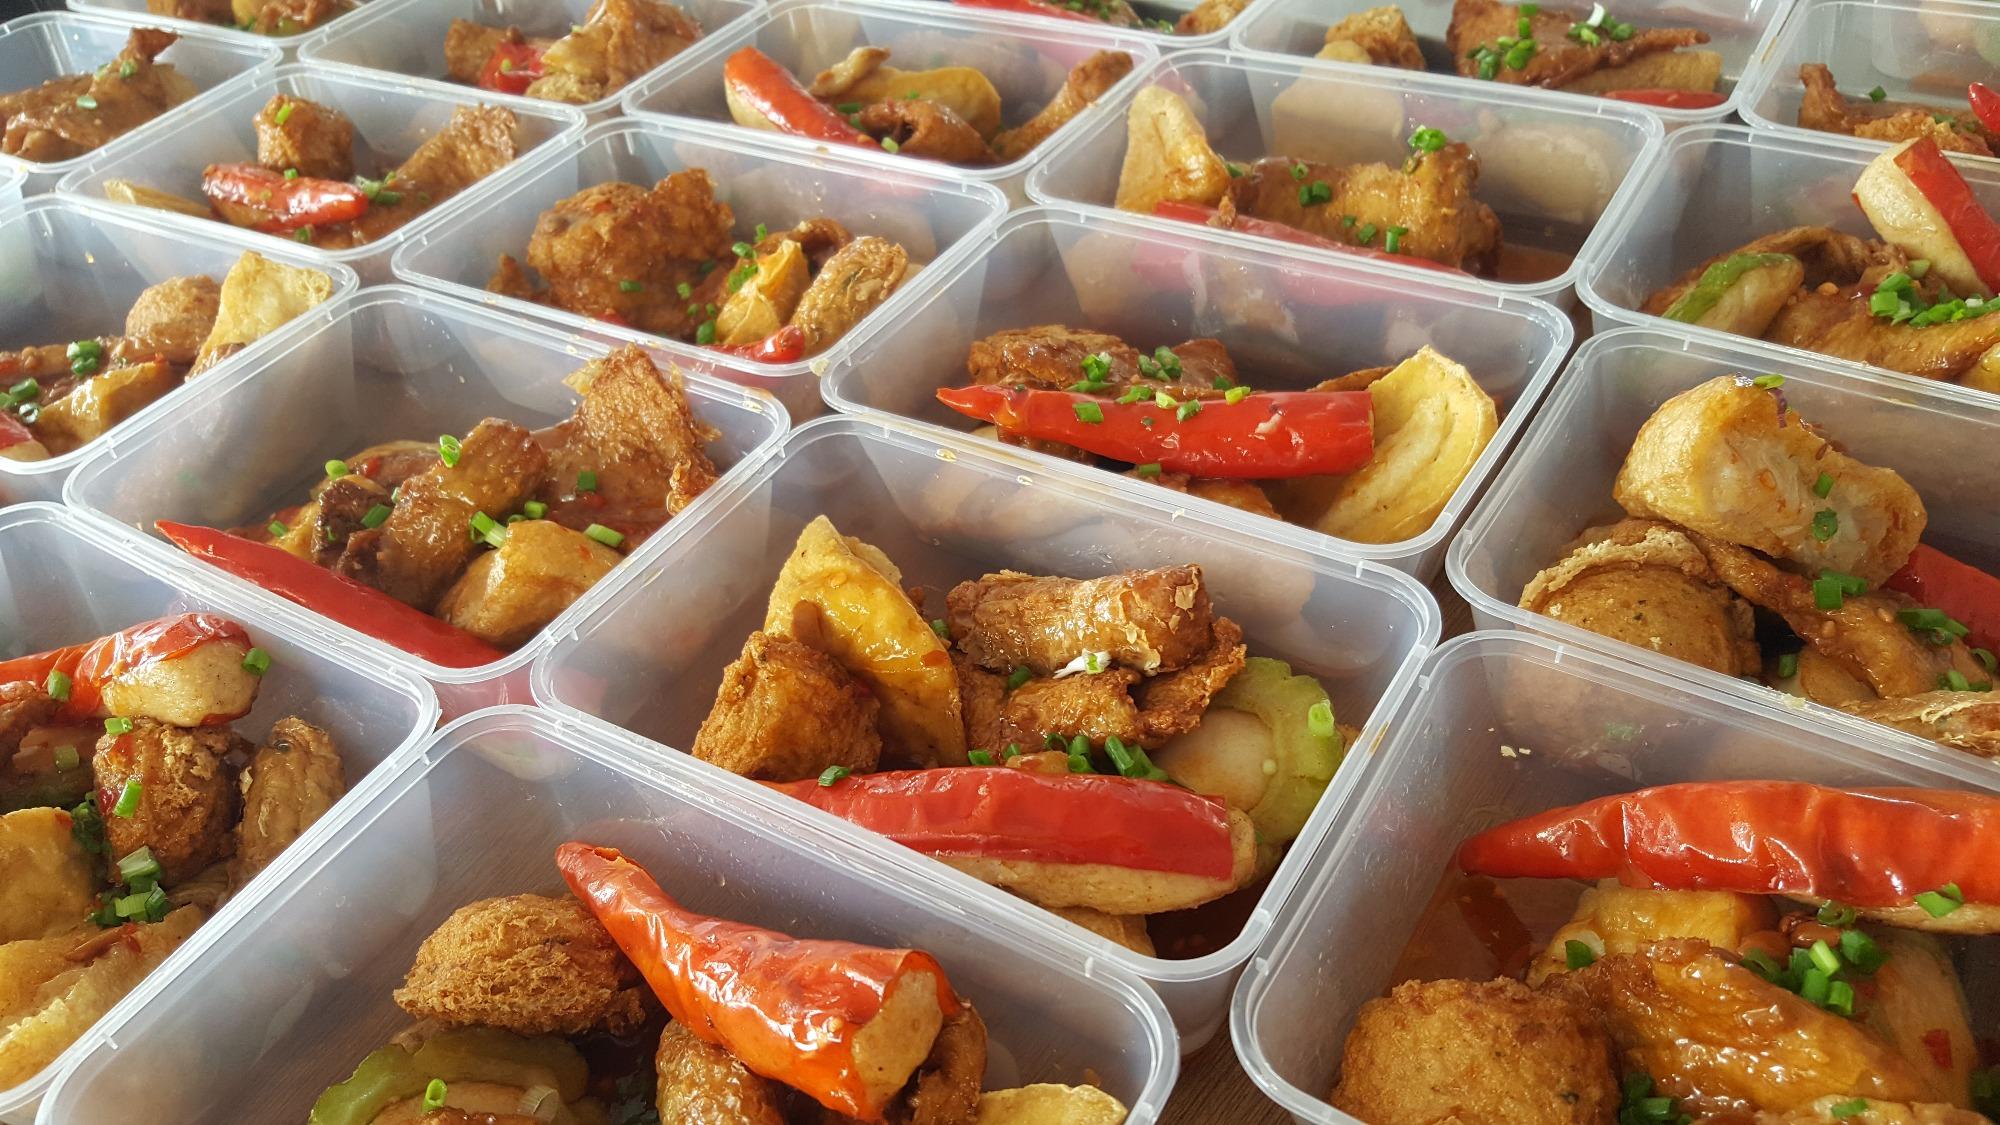 H Catering Pte Ltd Hong Choo Pte L...